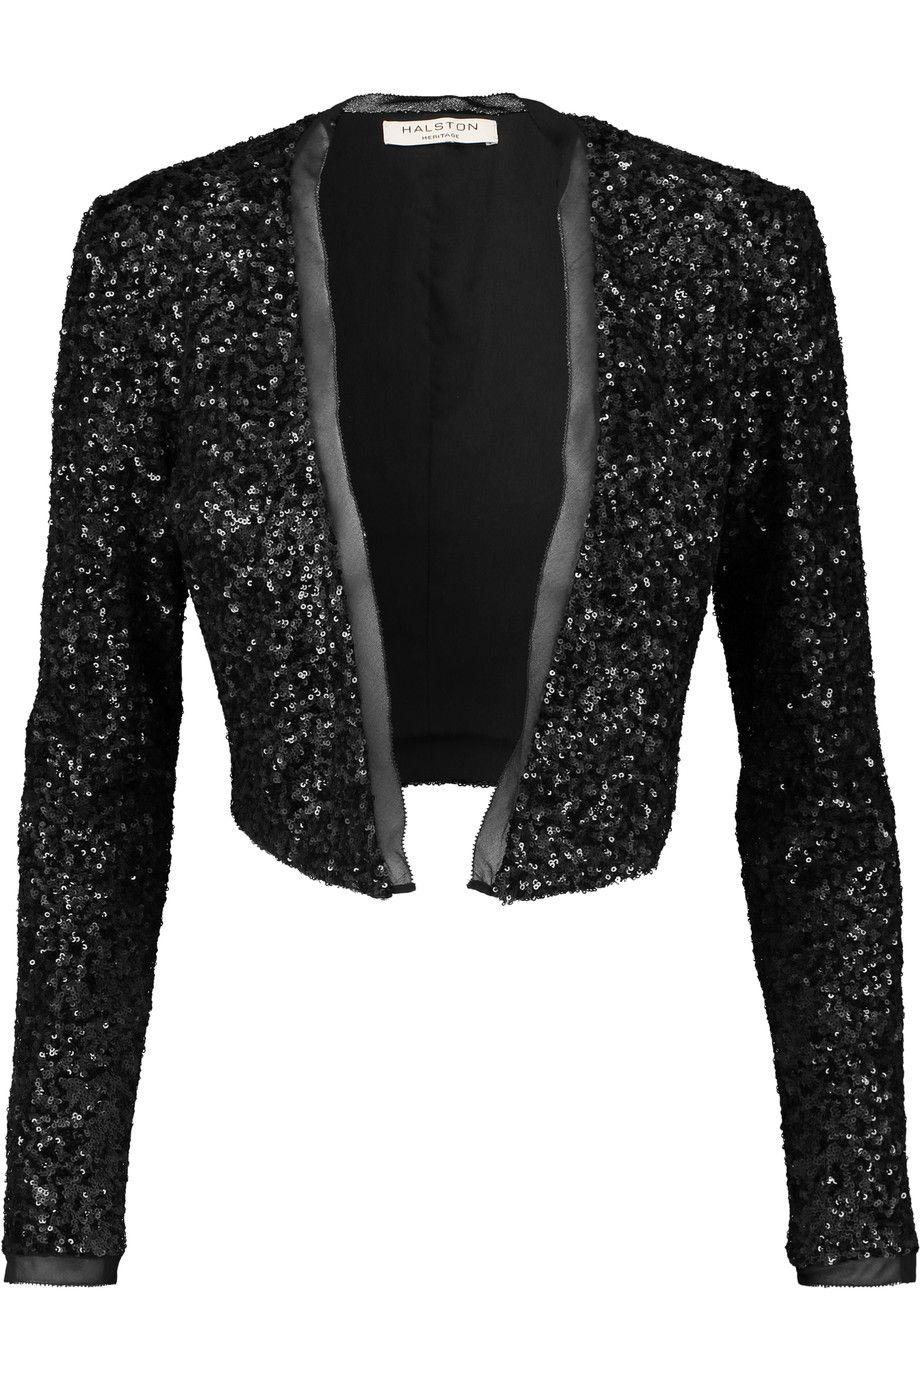 HALSTON HERITAGE Cropped Sequined Tulle Jacket. #halstonheritage #cloth #jacket